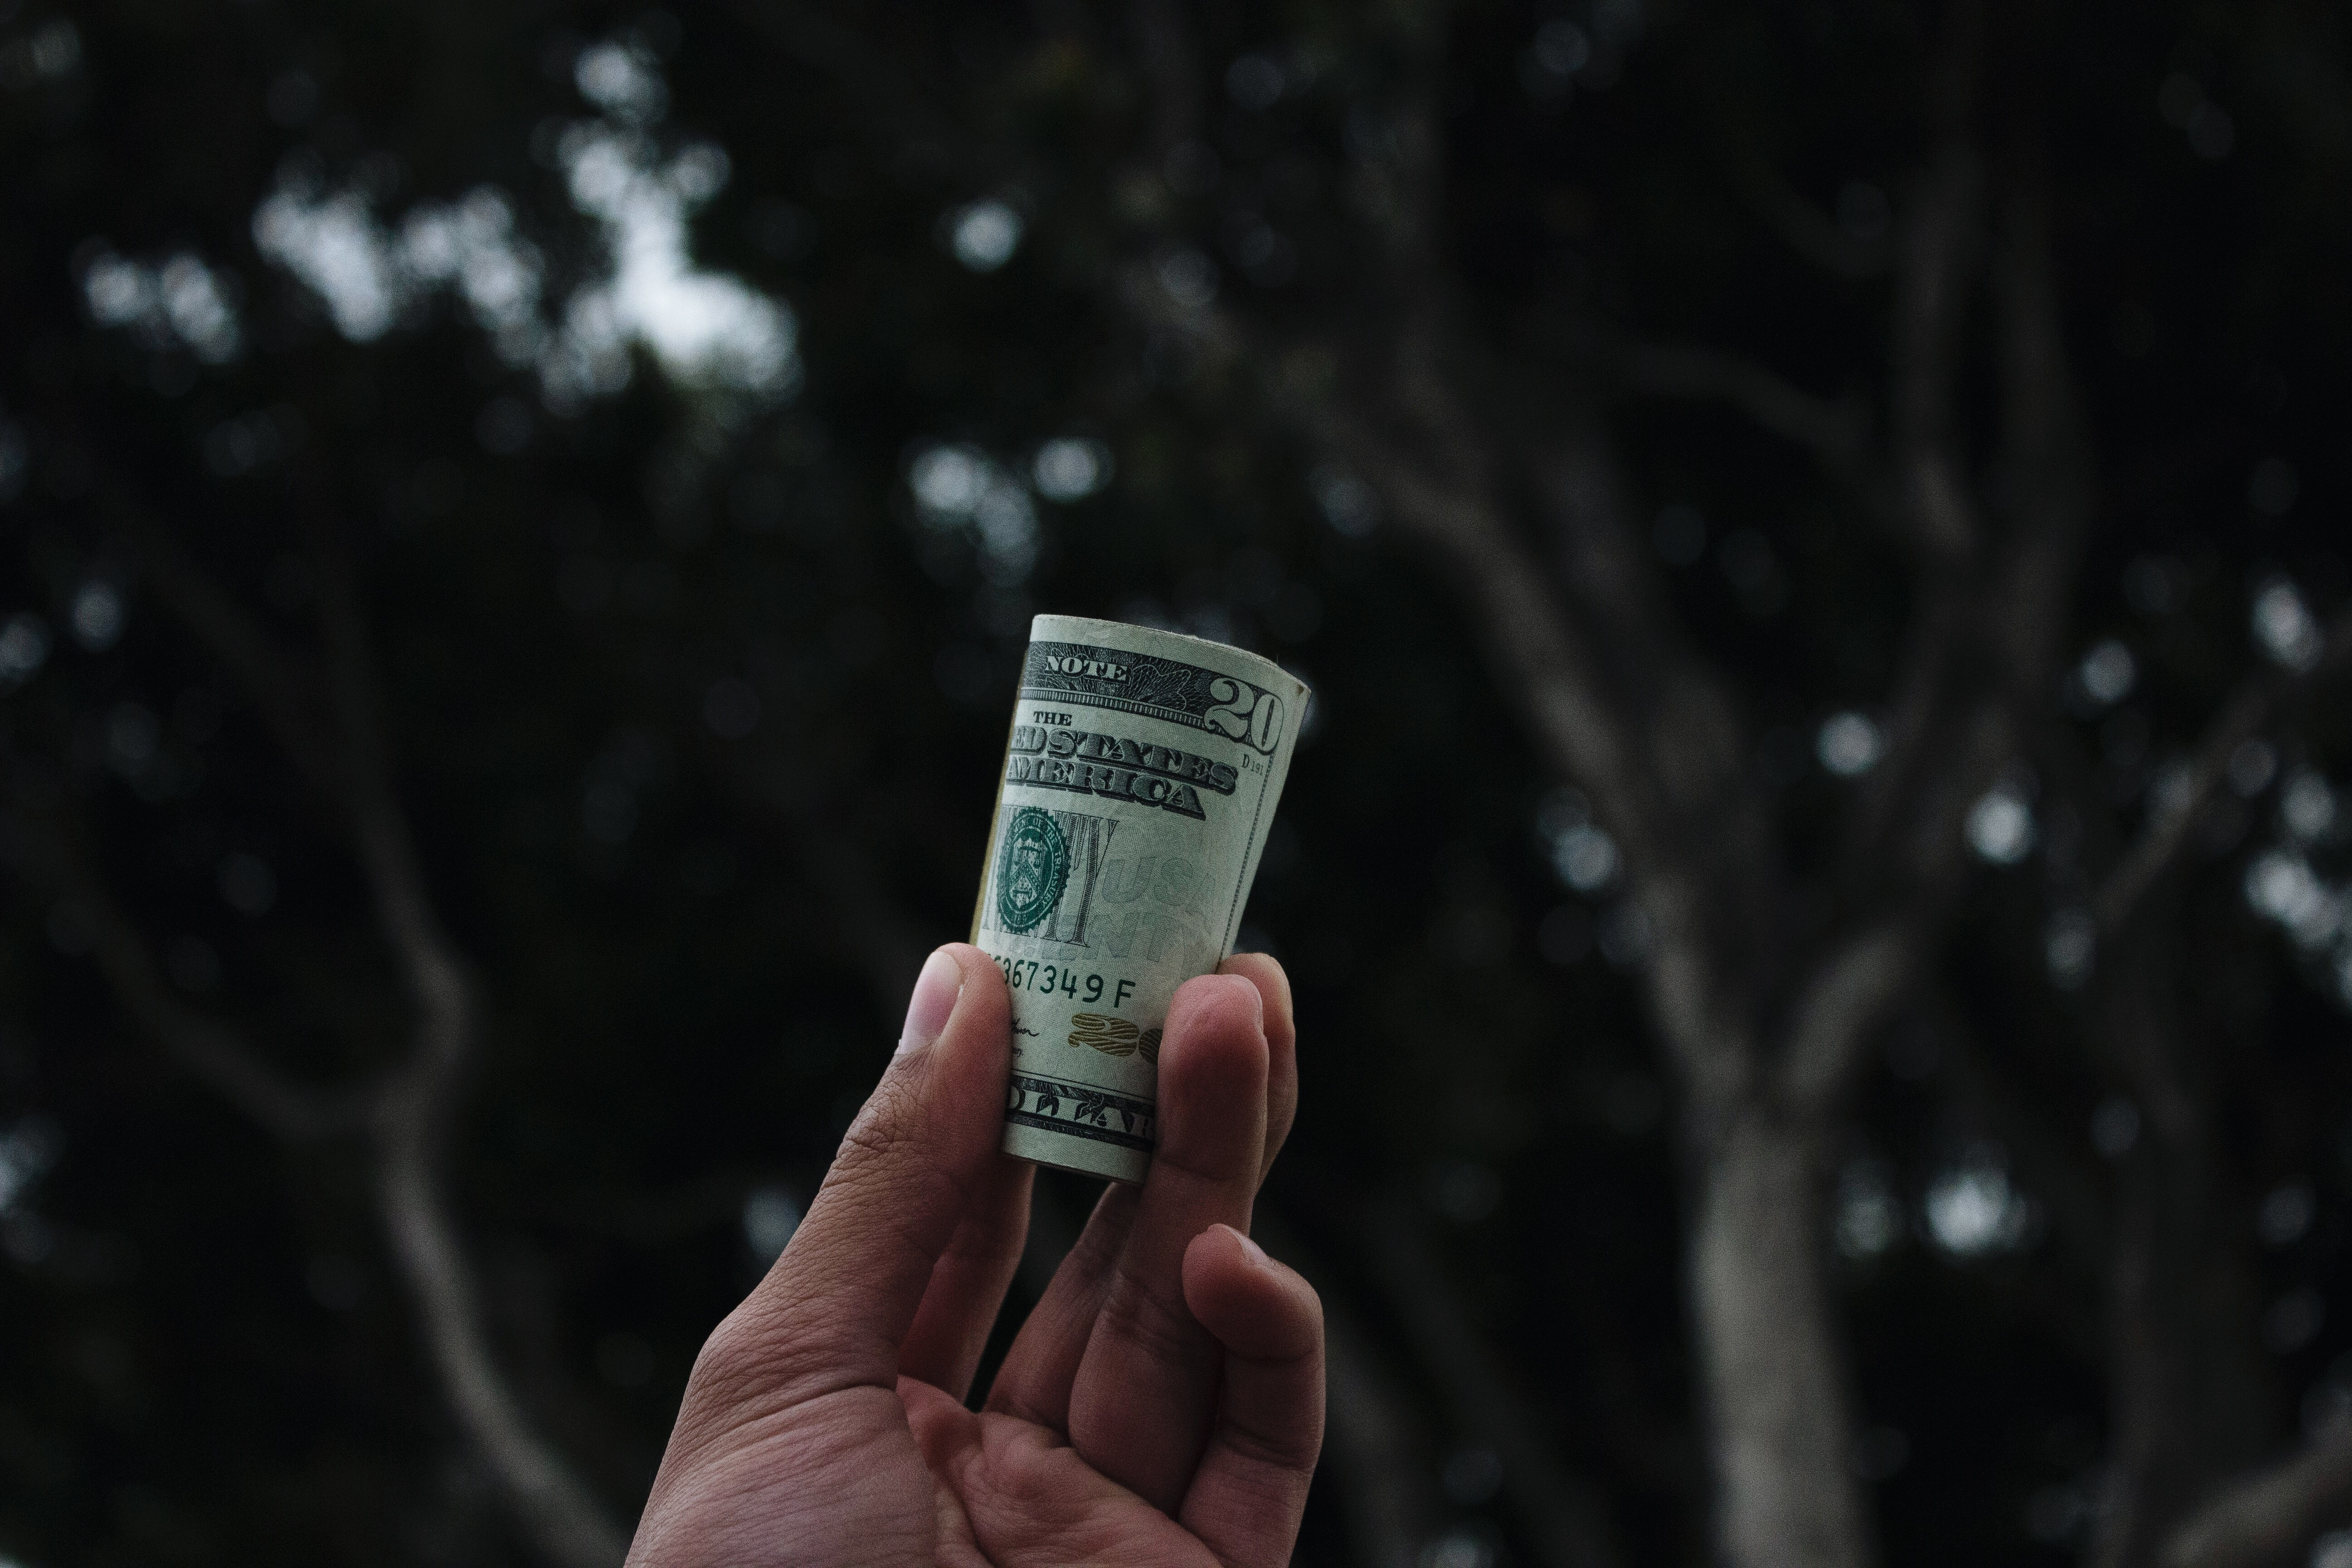 crowdfunding costs money